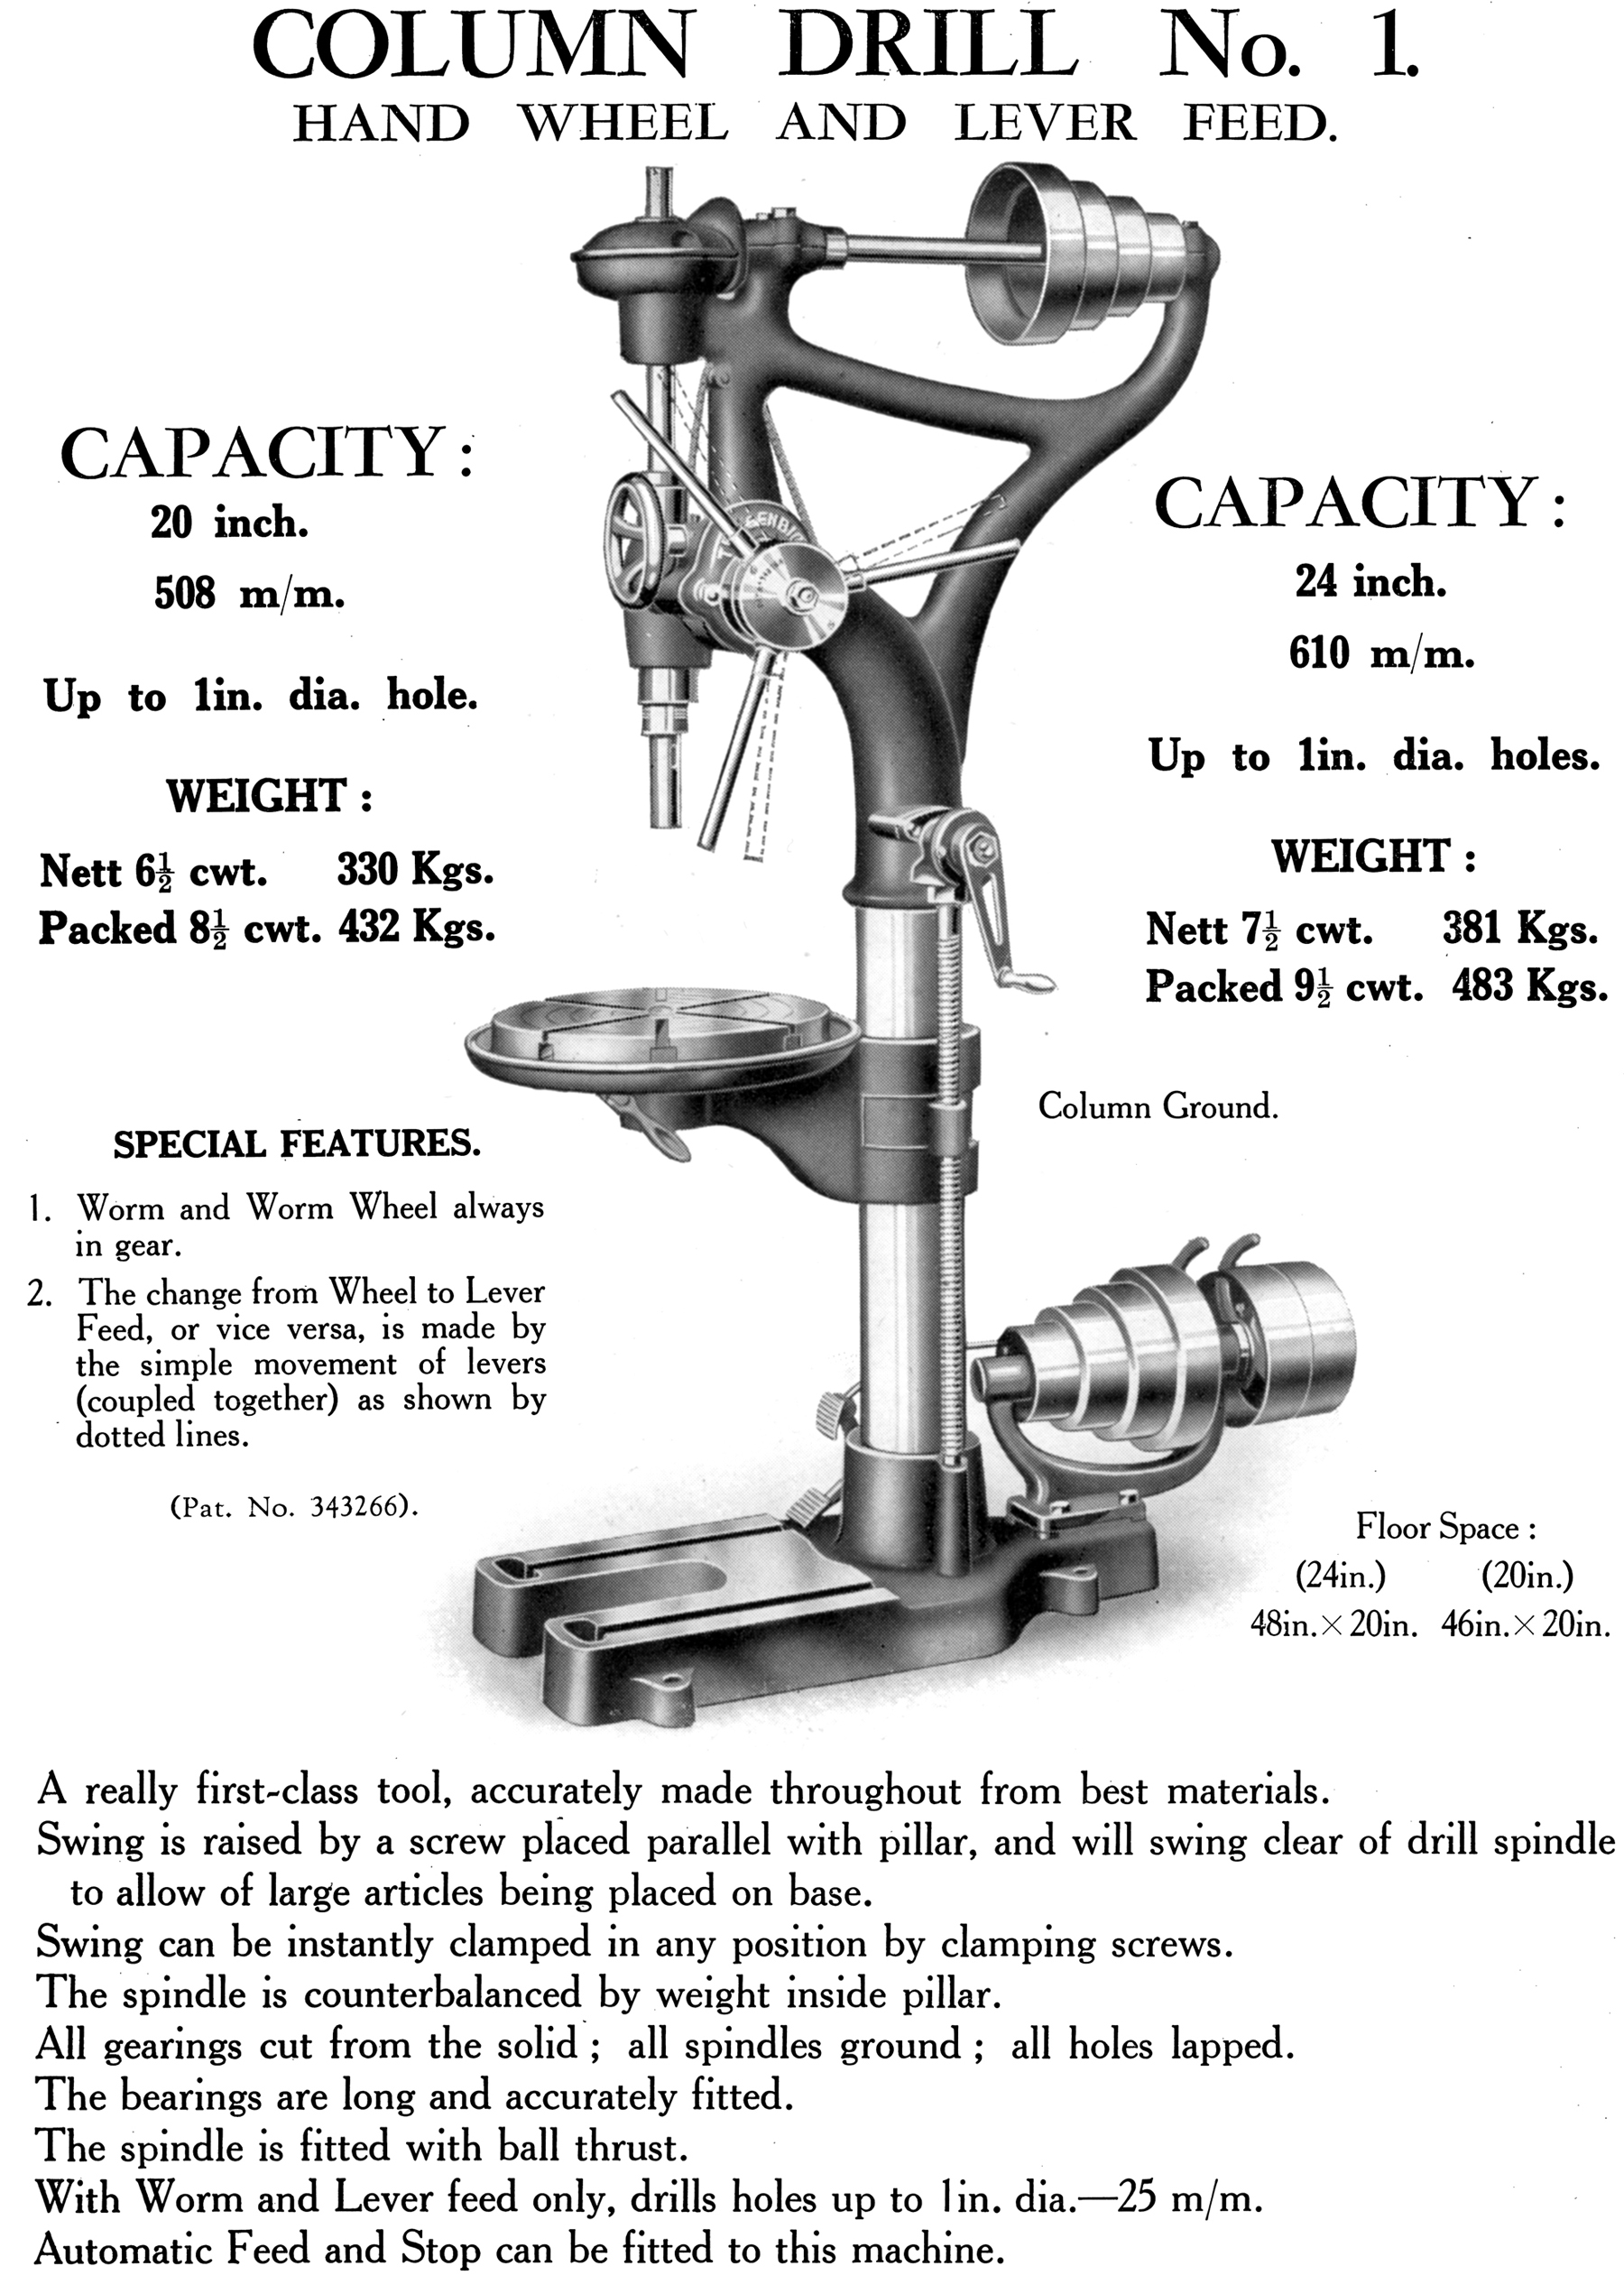 Mechanical hand drilling machine